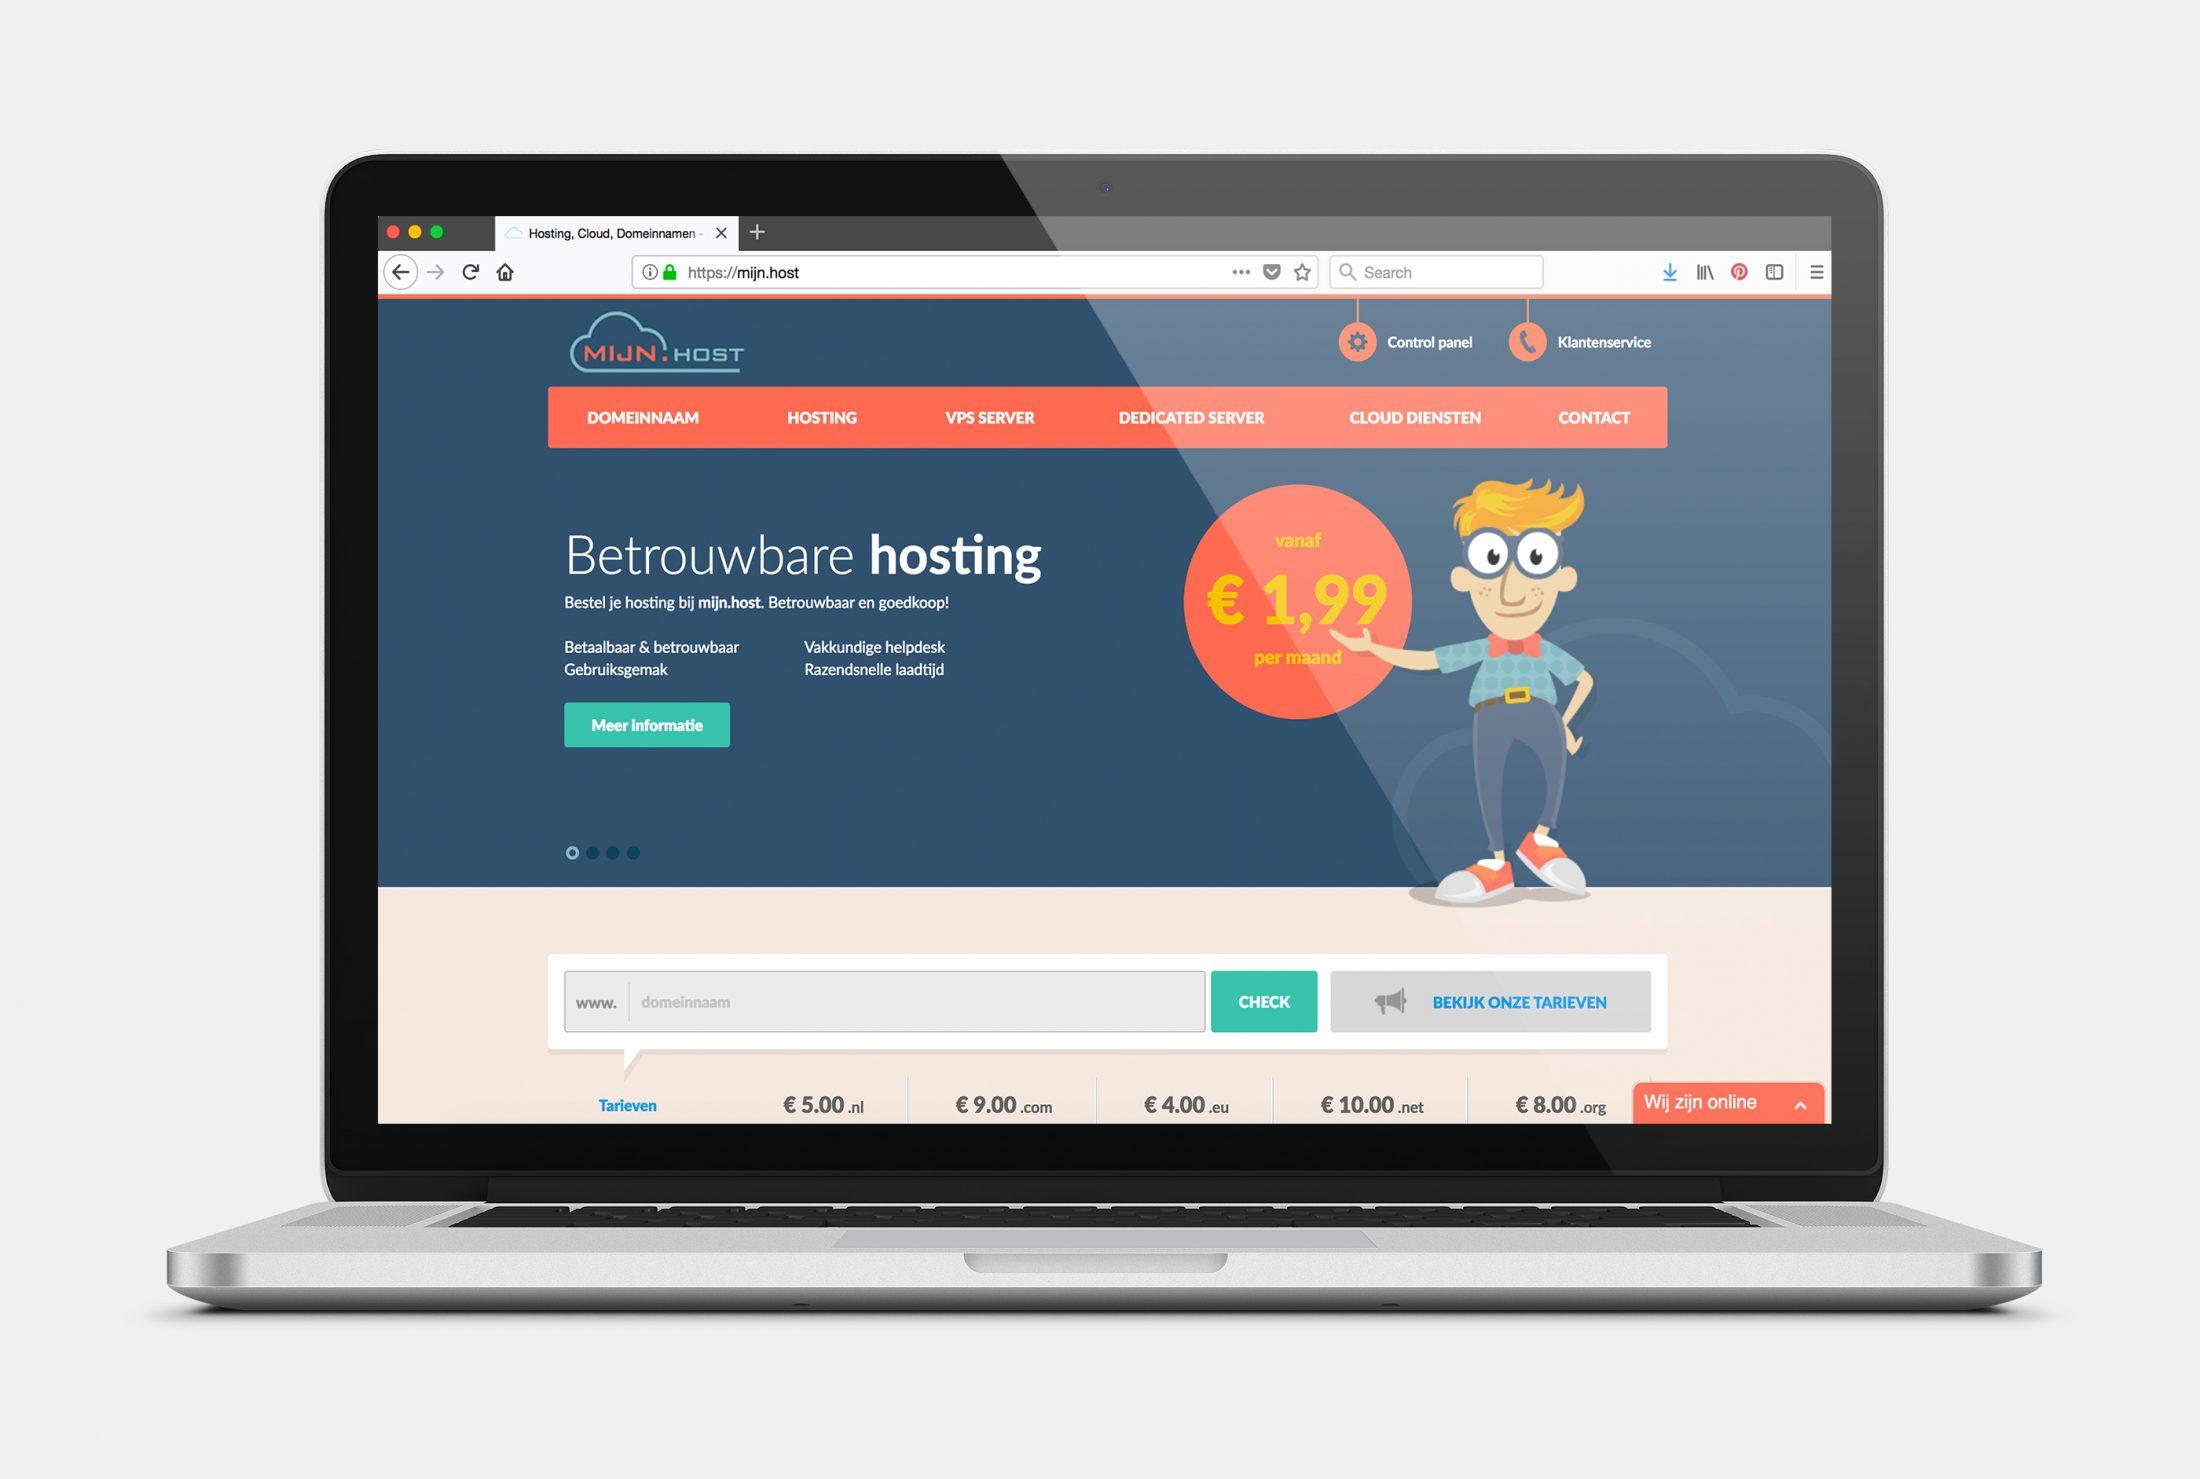 Mijn host web